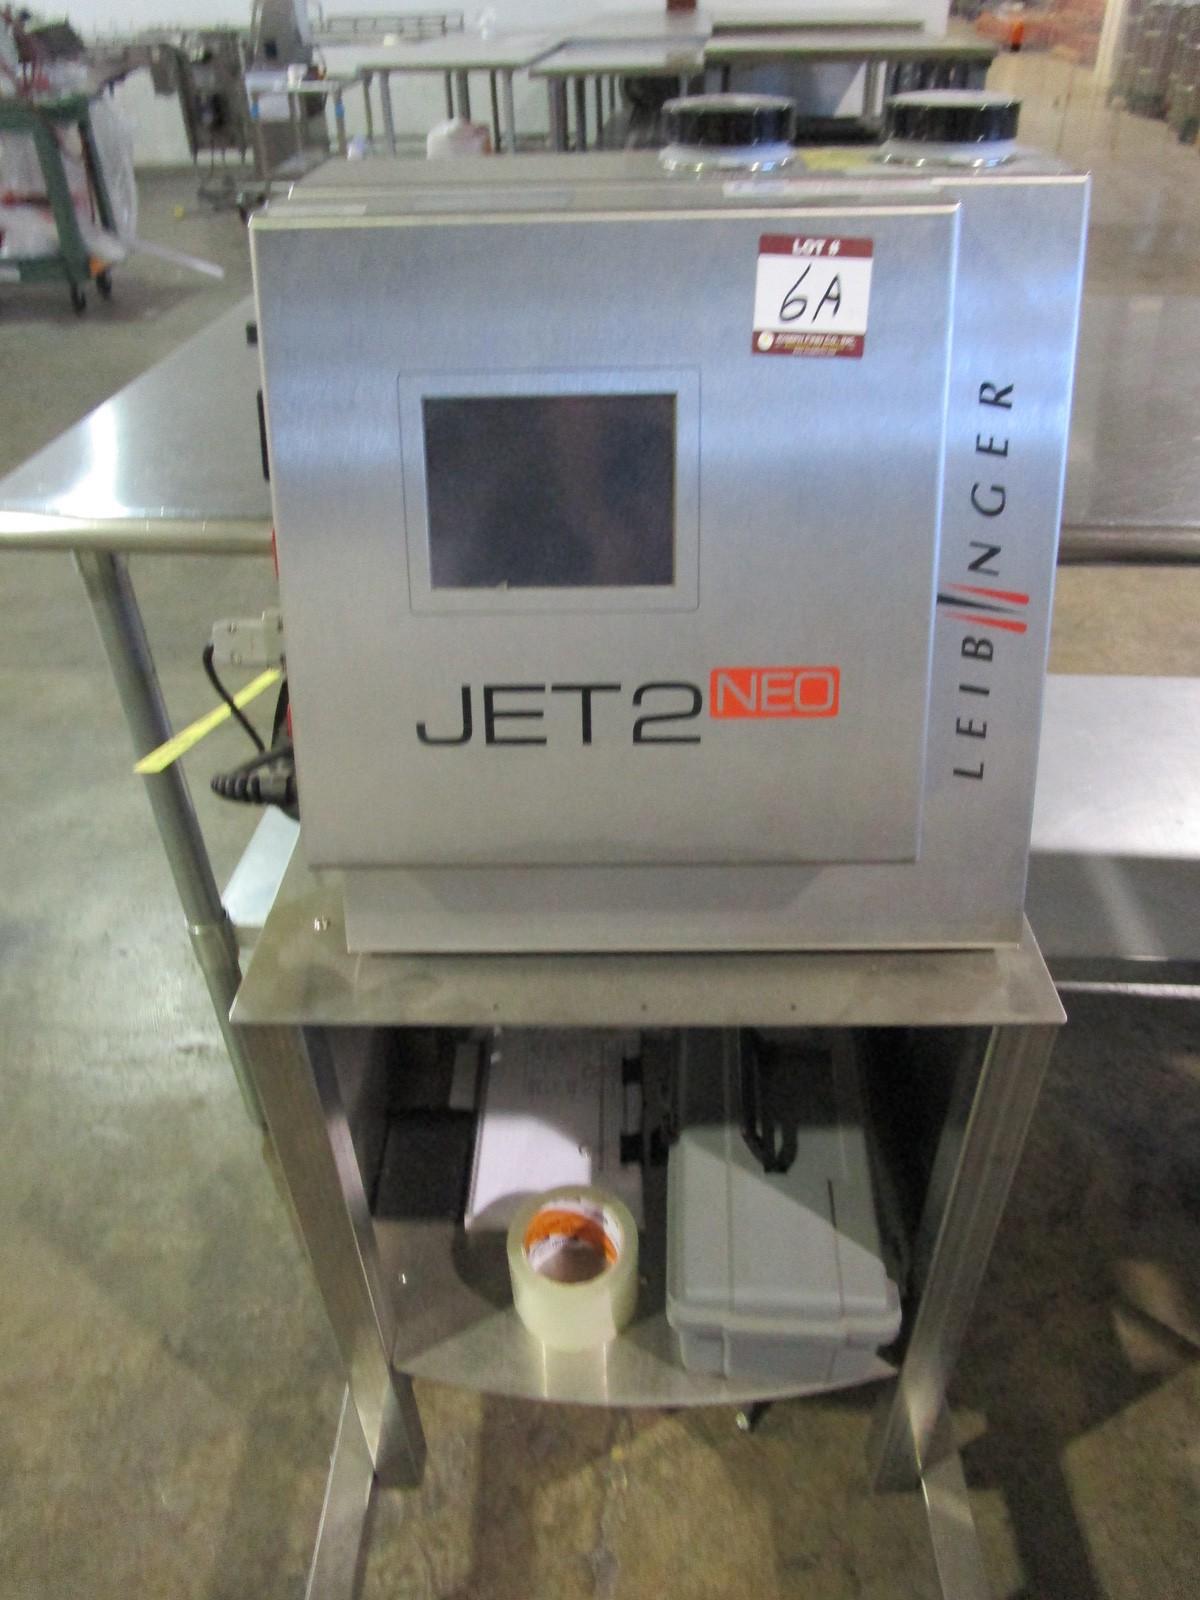 Lot 6A - 2017 Leibinger Jet2 Neo Ink Jet Printer s/n LJ-410776 | Rig Fee: $75